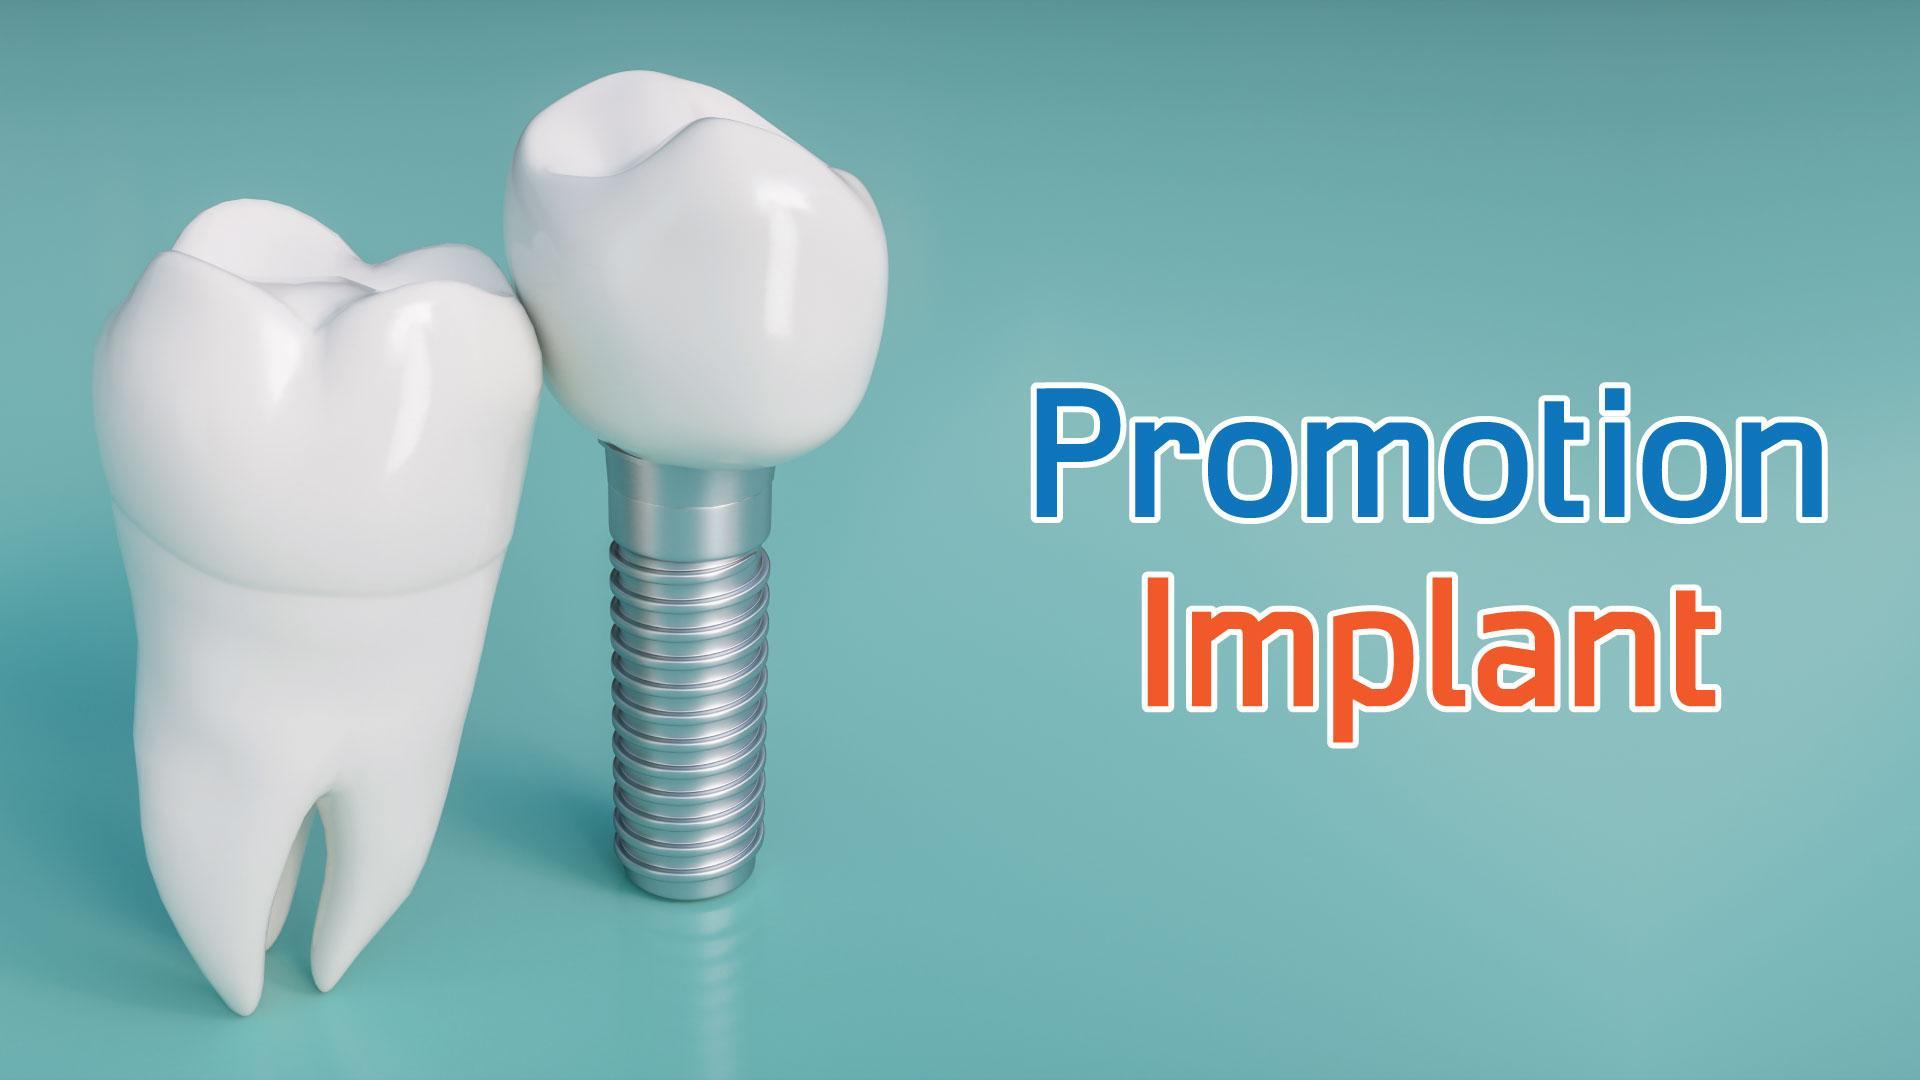 Implant promotion